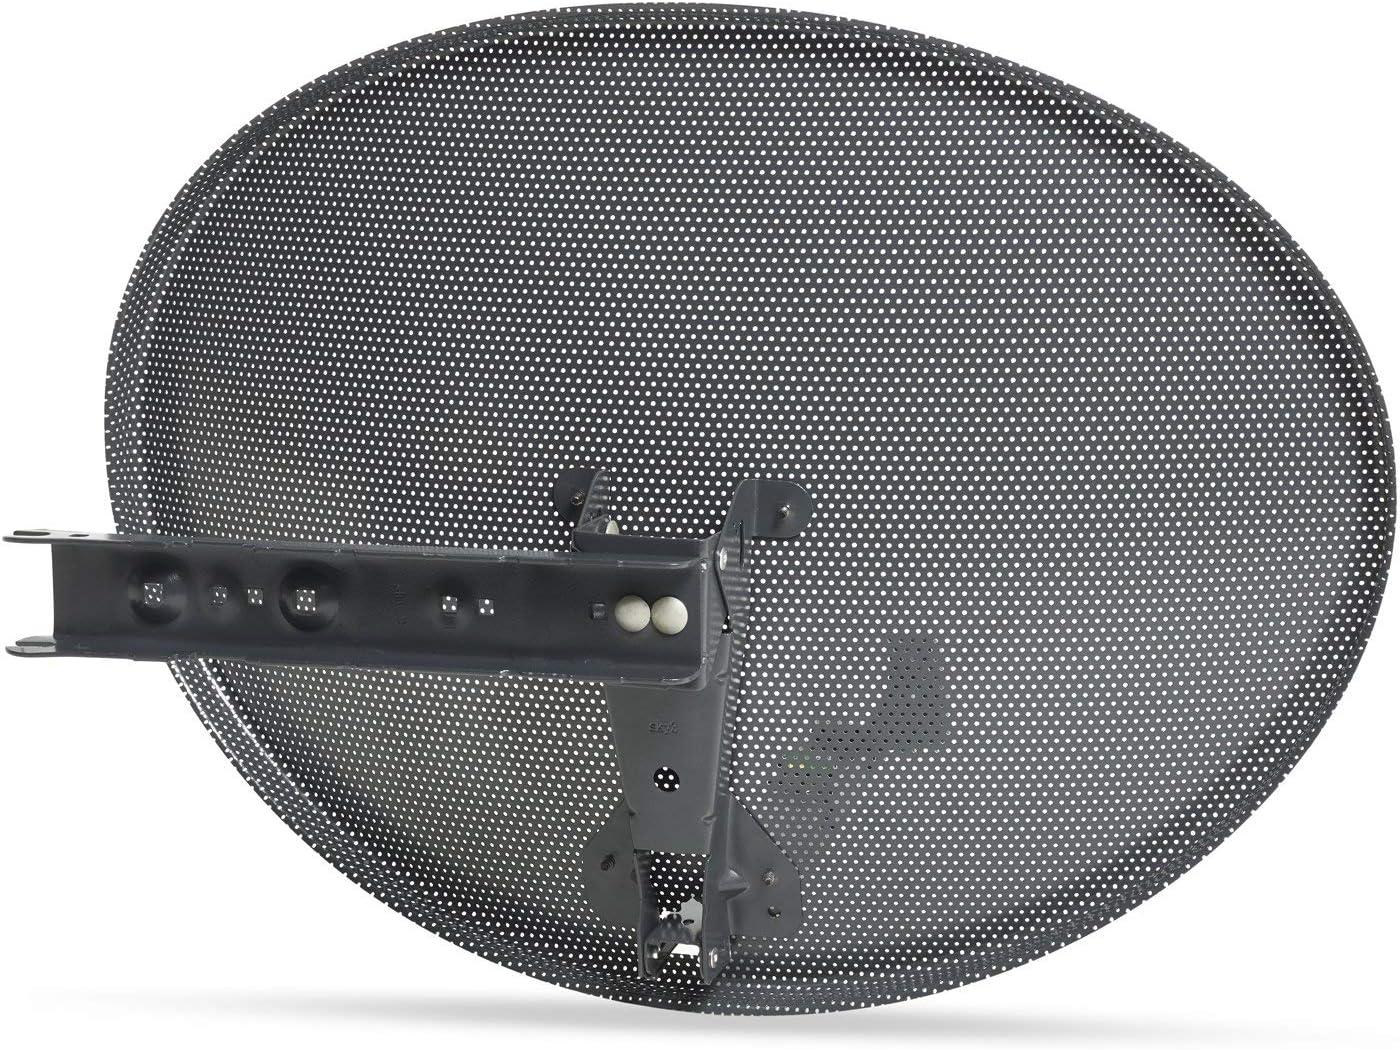 new style SSL Satellites Zone 20 Satellite Dish & Twin LNB for Sky ...